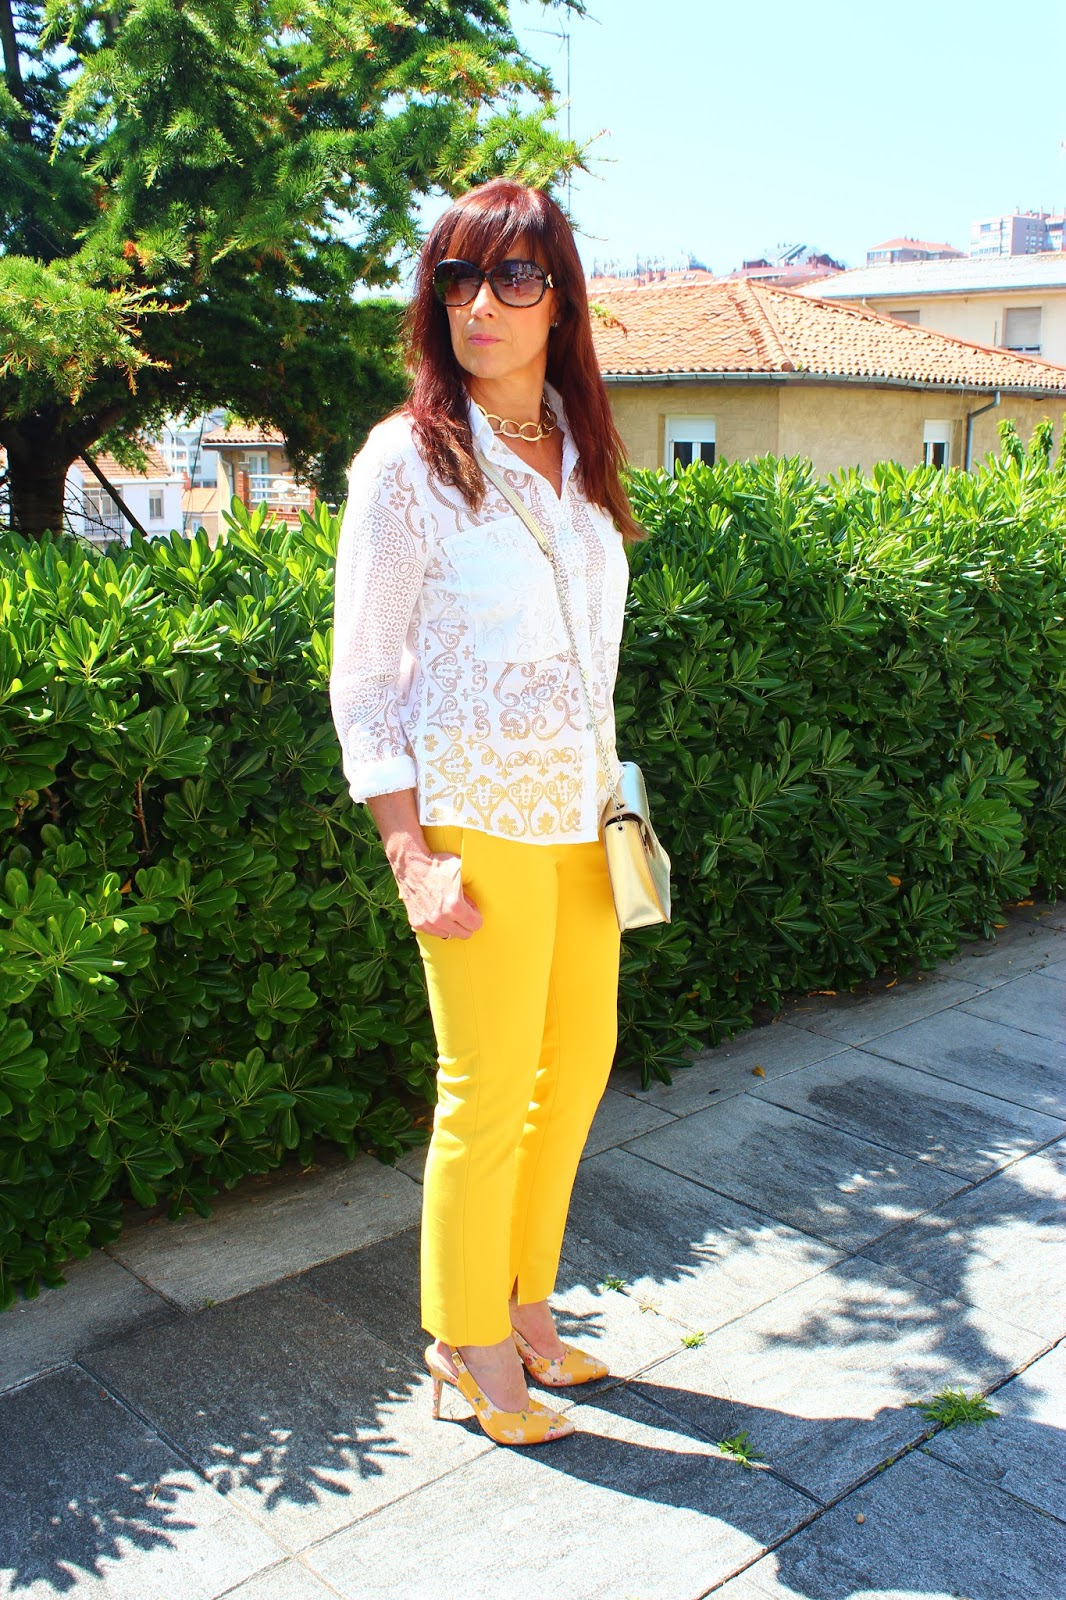 Br jula de estilo mis looks pantal n amarillo - Brujula de estilo ...